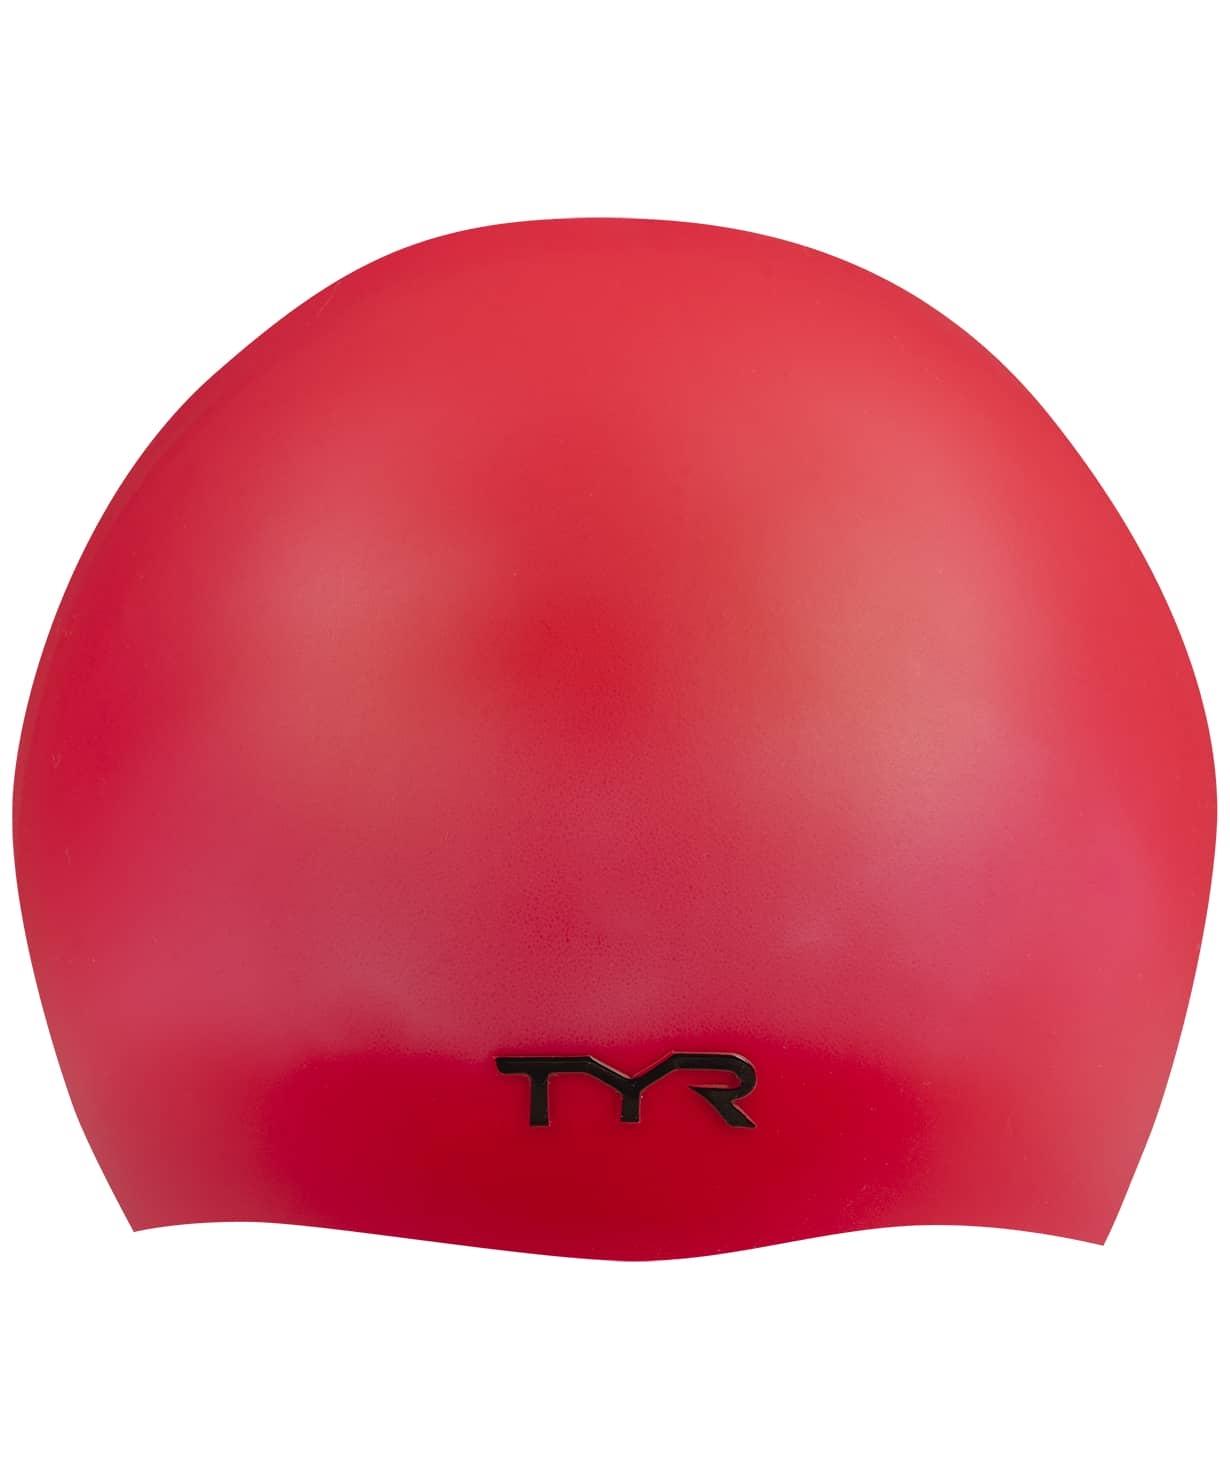 Шапочка для плавания Wrinkle Free Silicone Cap, силикон, LCS/610, красный